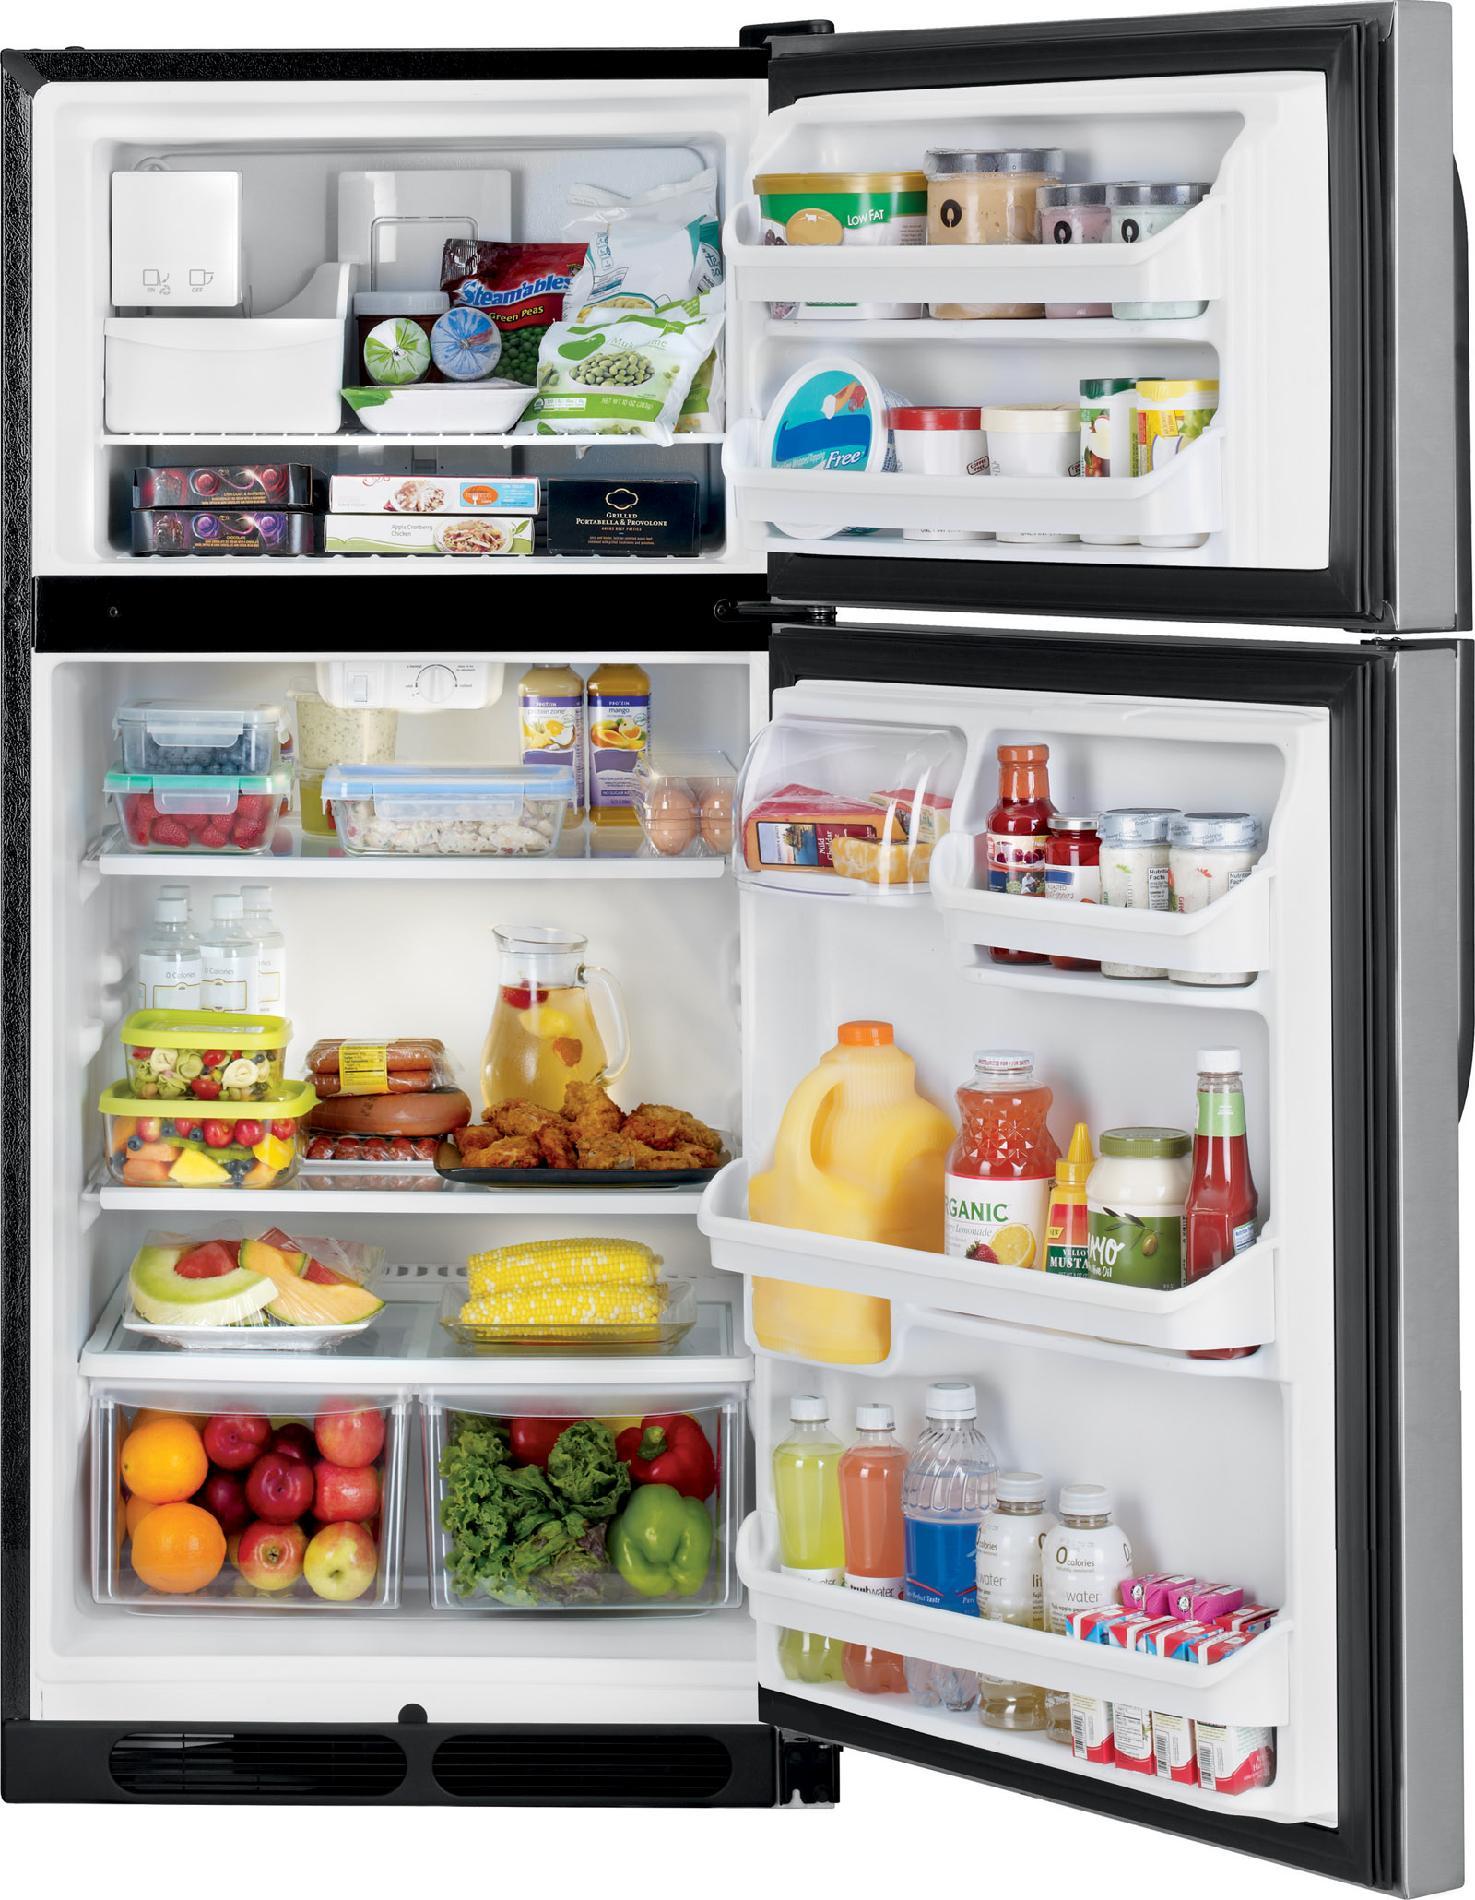 Kenmore 70303 14.5 cu. ft. Top Freezer Refrigerator - Stainless